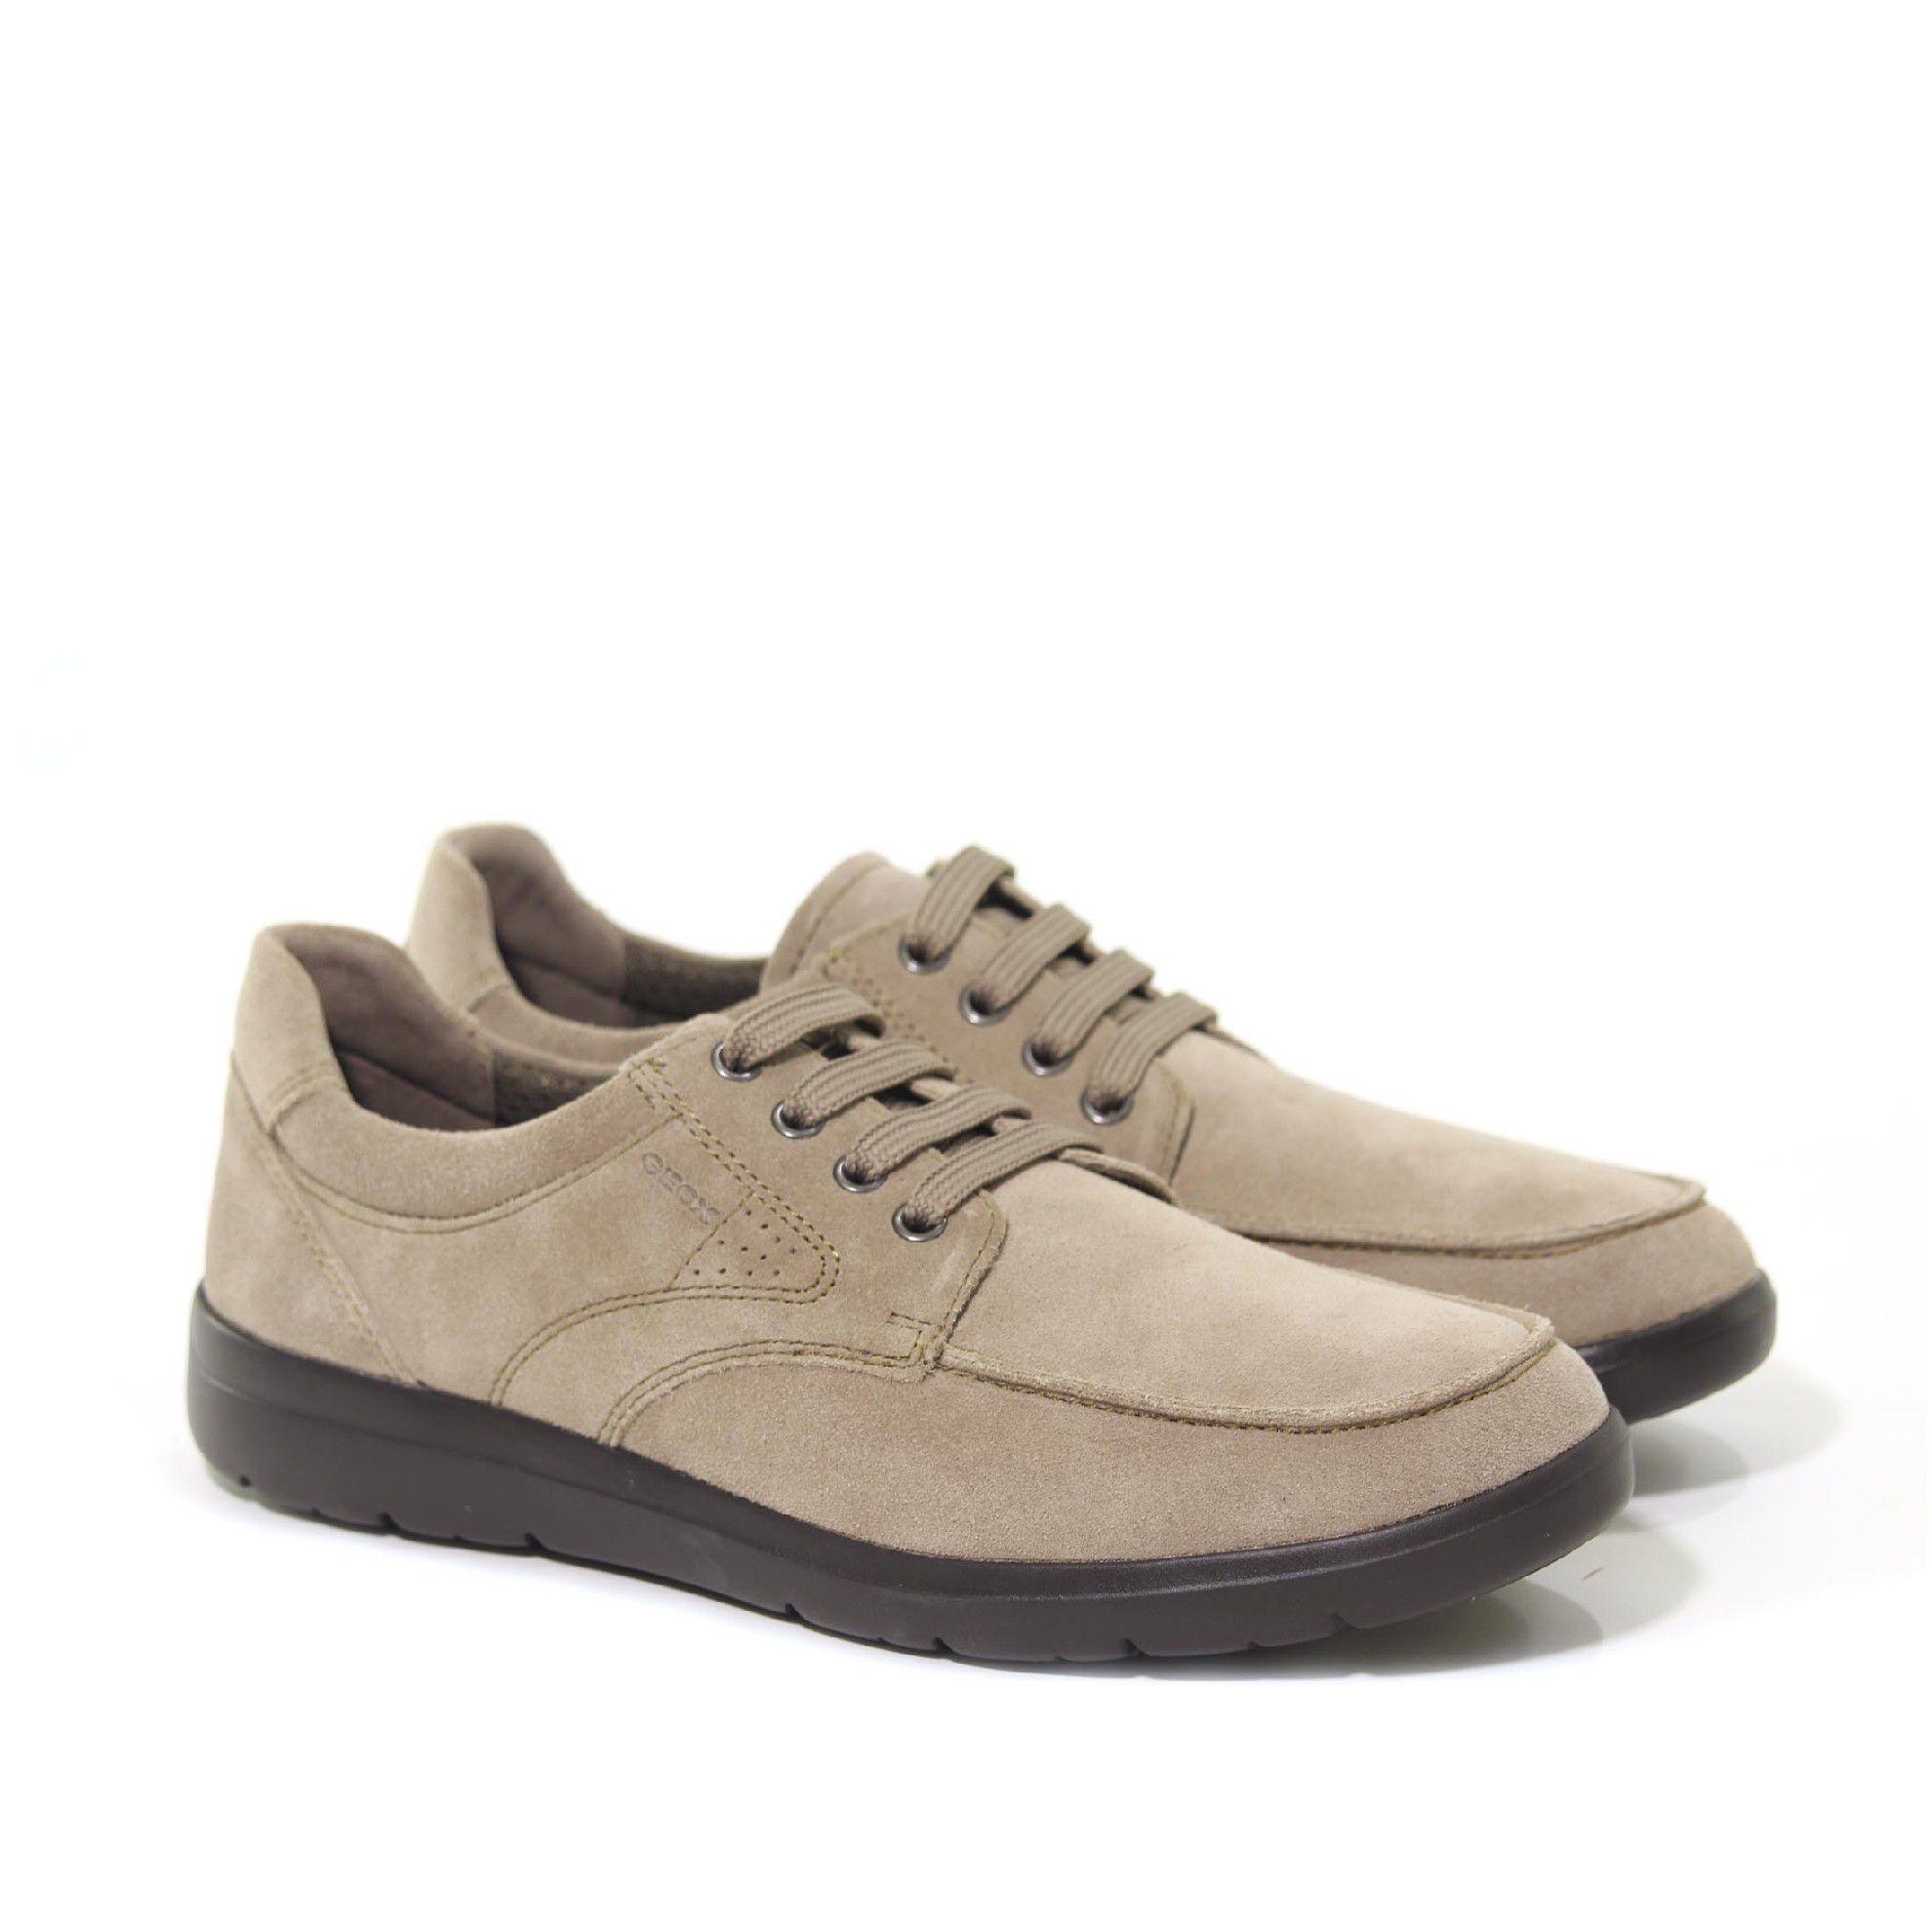 Geox sneaker leitan b in suede da uomo